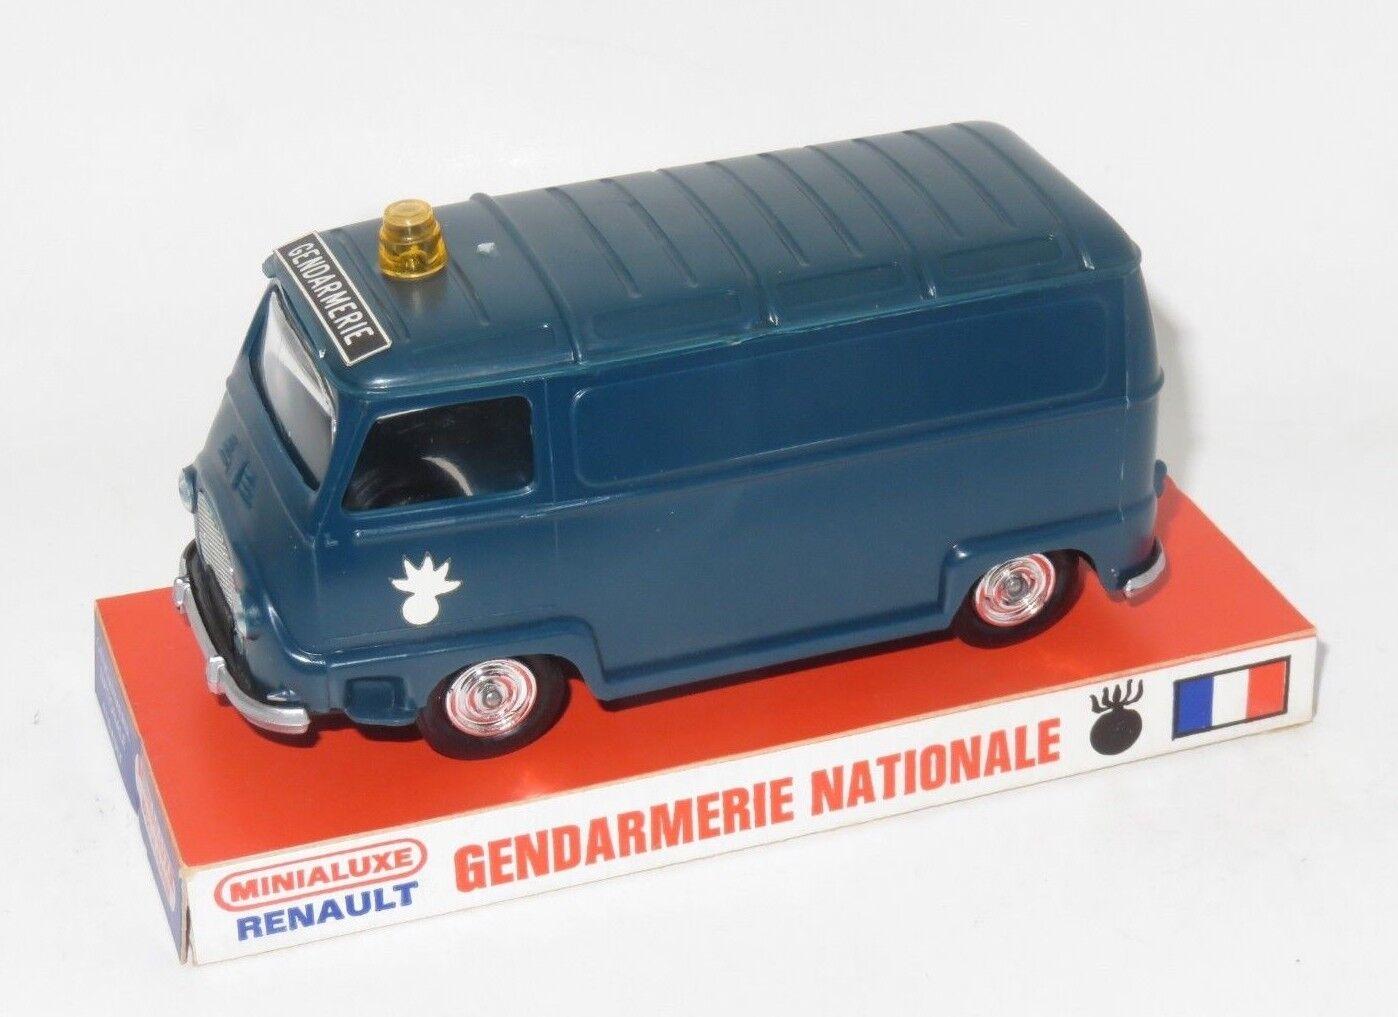 Minialuxe renault gendarmerie nationale   polizei - 1   32 aus plastik, made in france